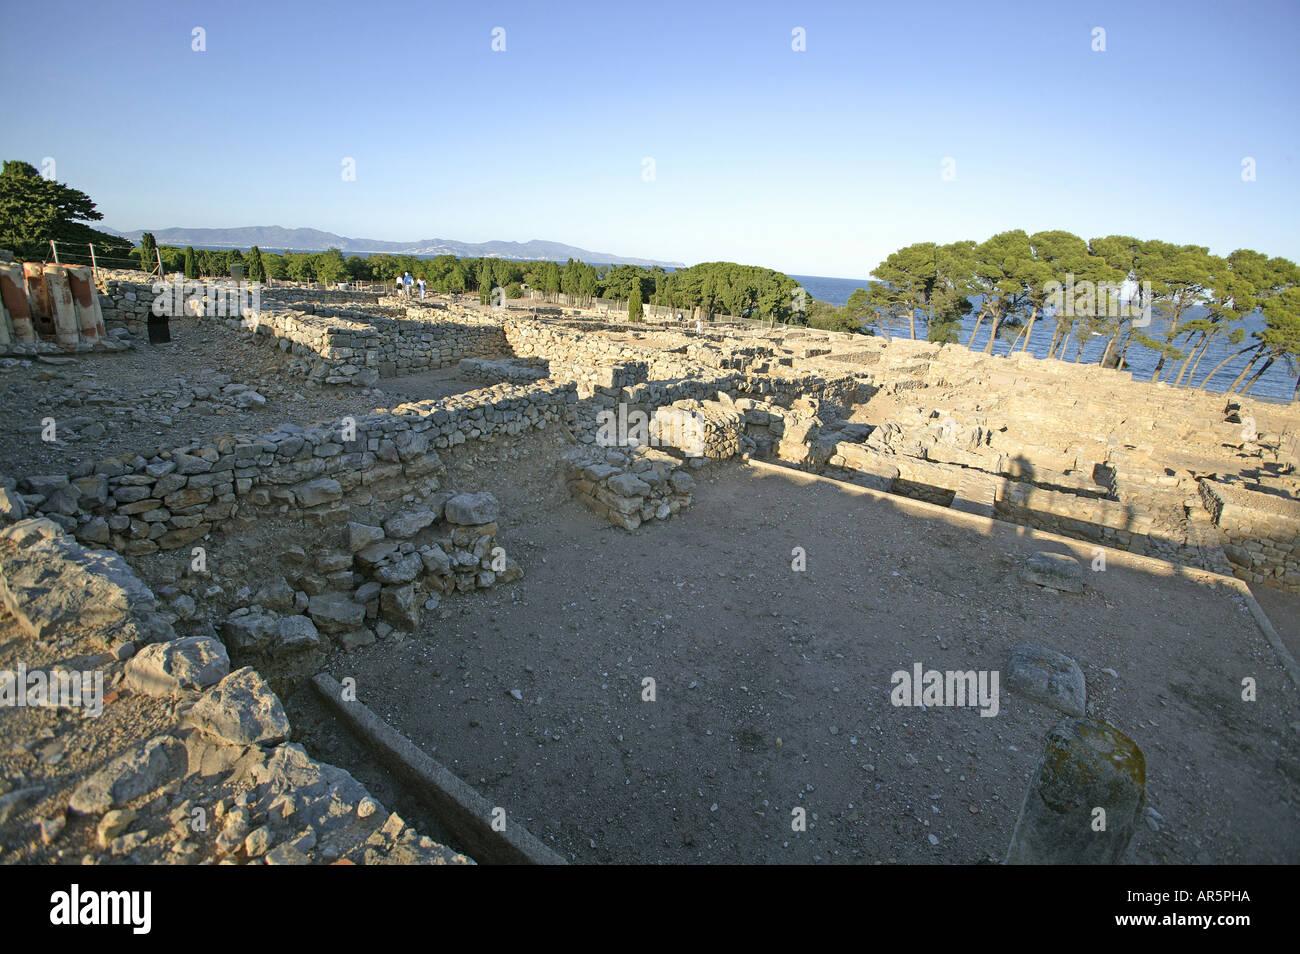 Costa Brava, Ancient Greek Settlement of Empuries, Costa Brava, Catalonia Spain - Stock Image